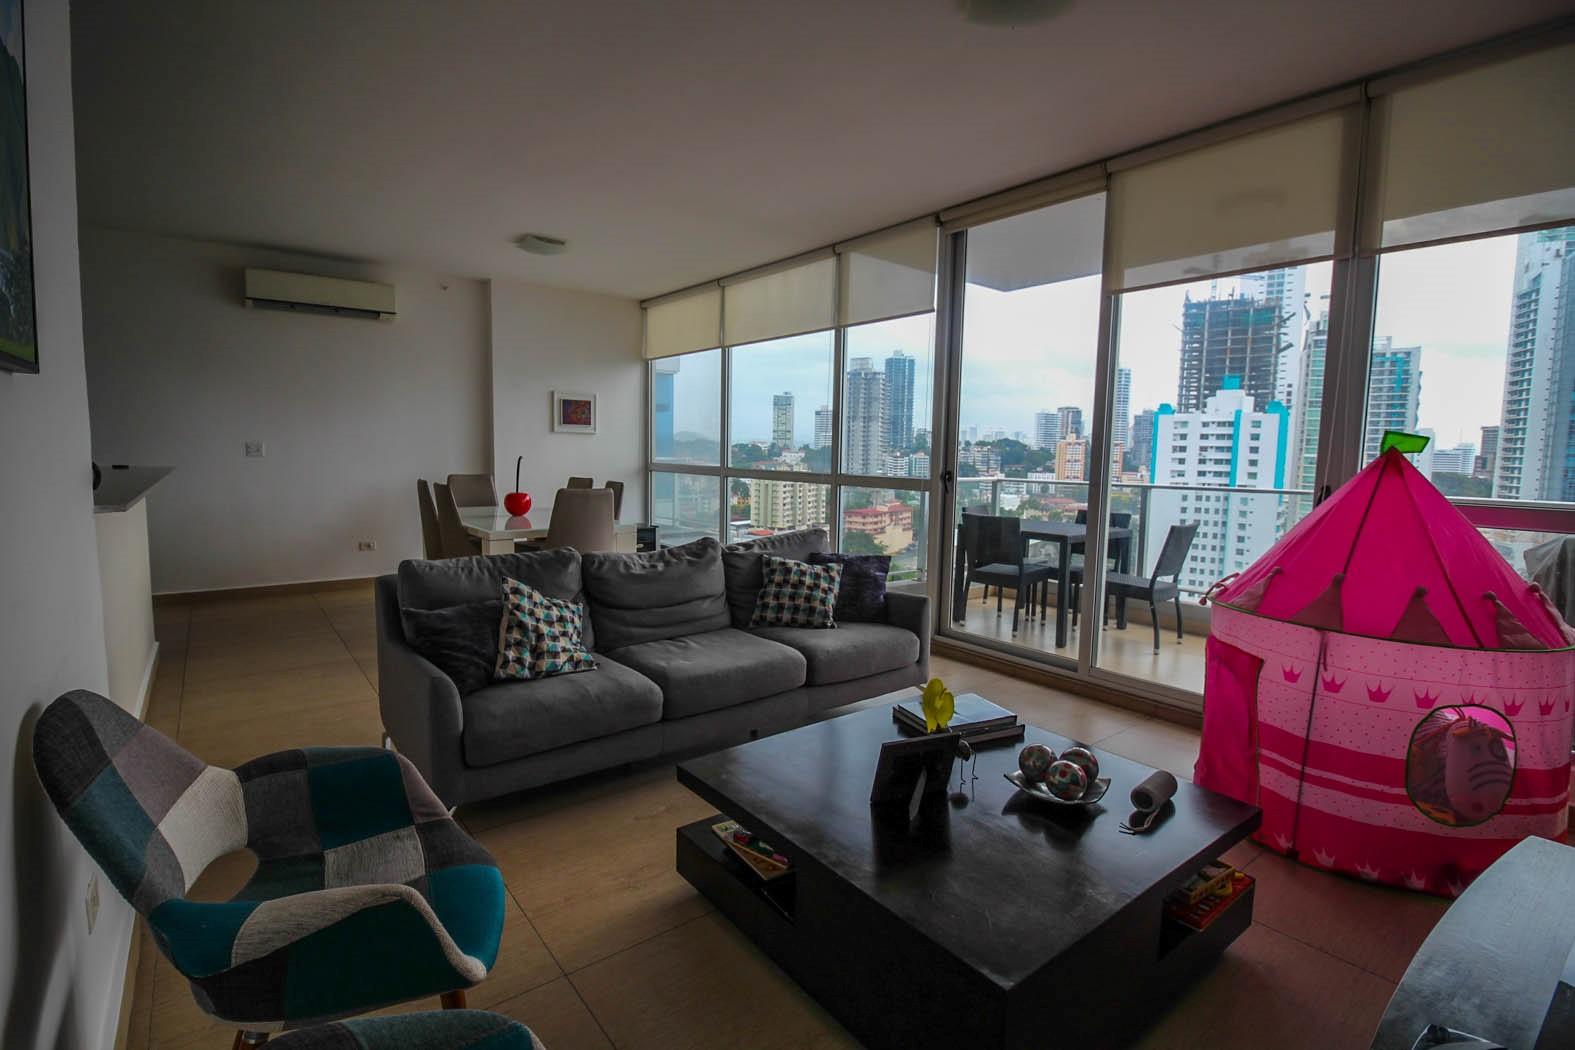 Avenida-Balboa-Panama-property-panamaequityocean-city-views-2nd-line-balboa-ave-6.jpg